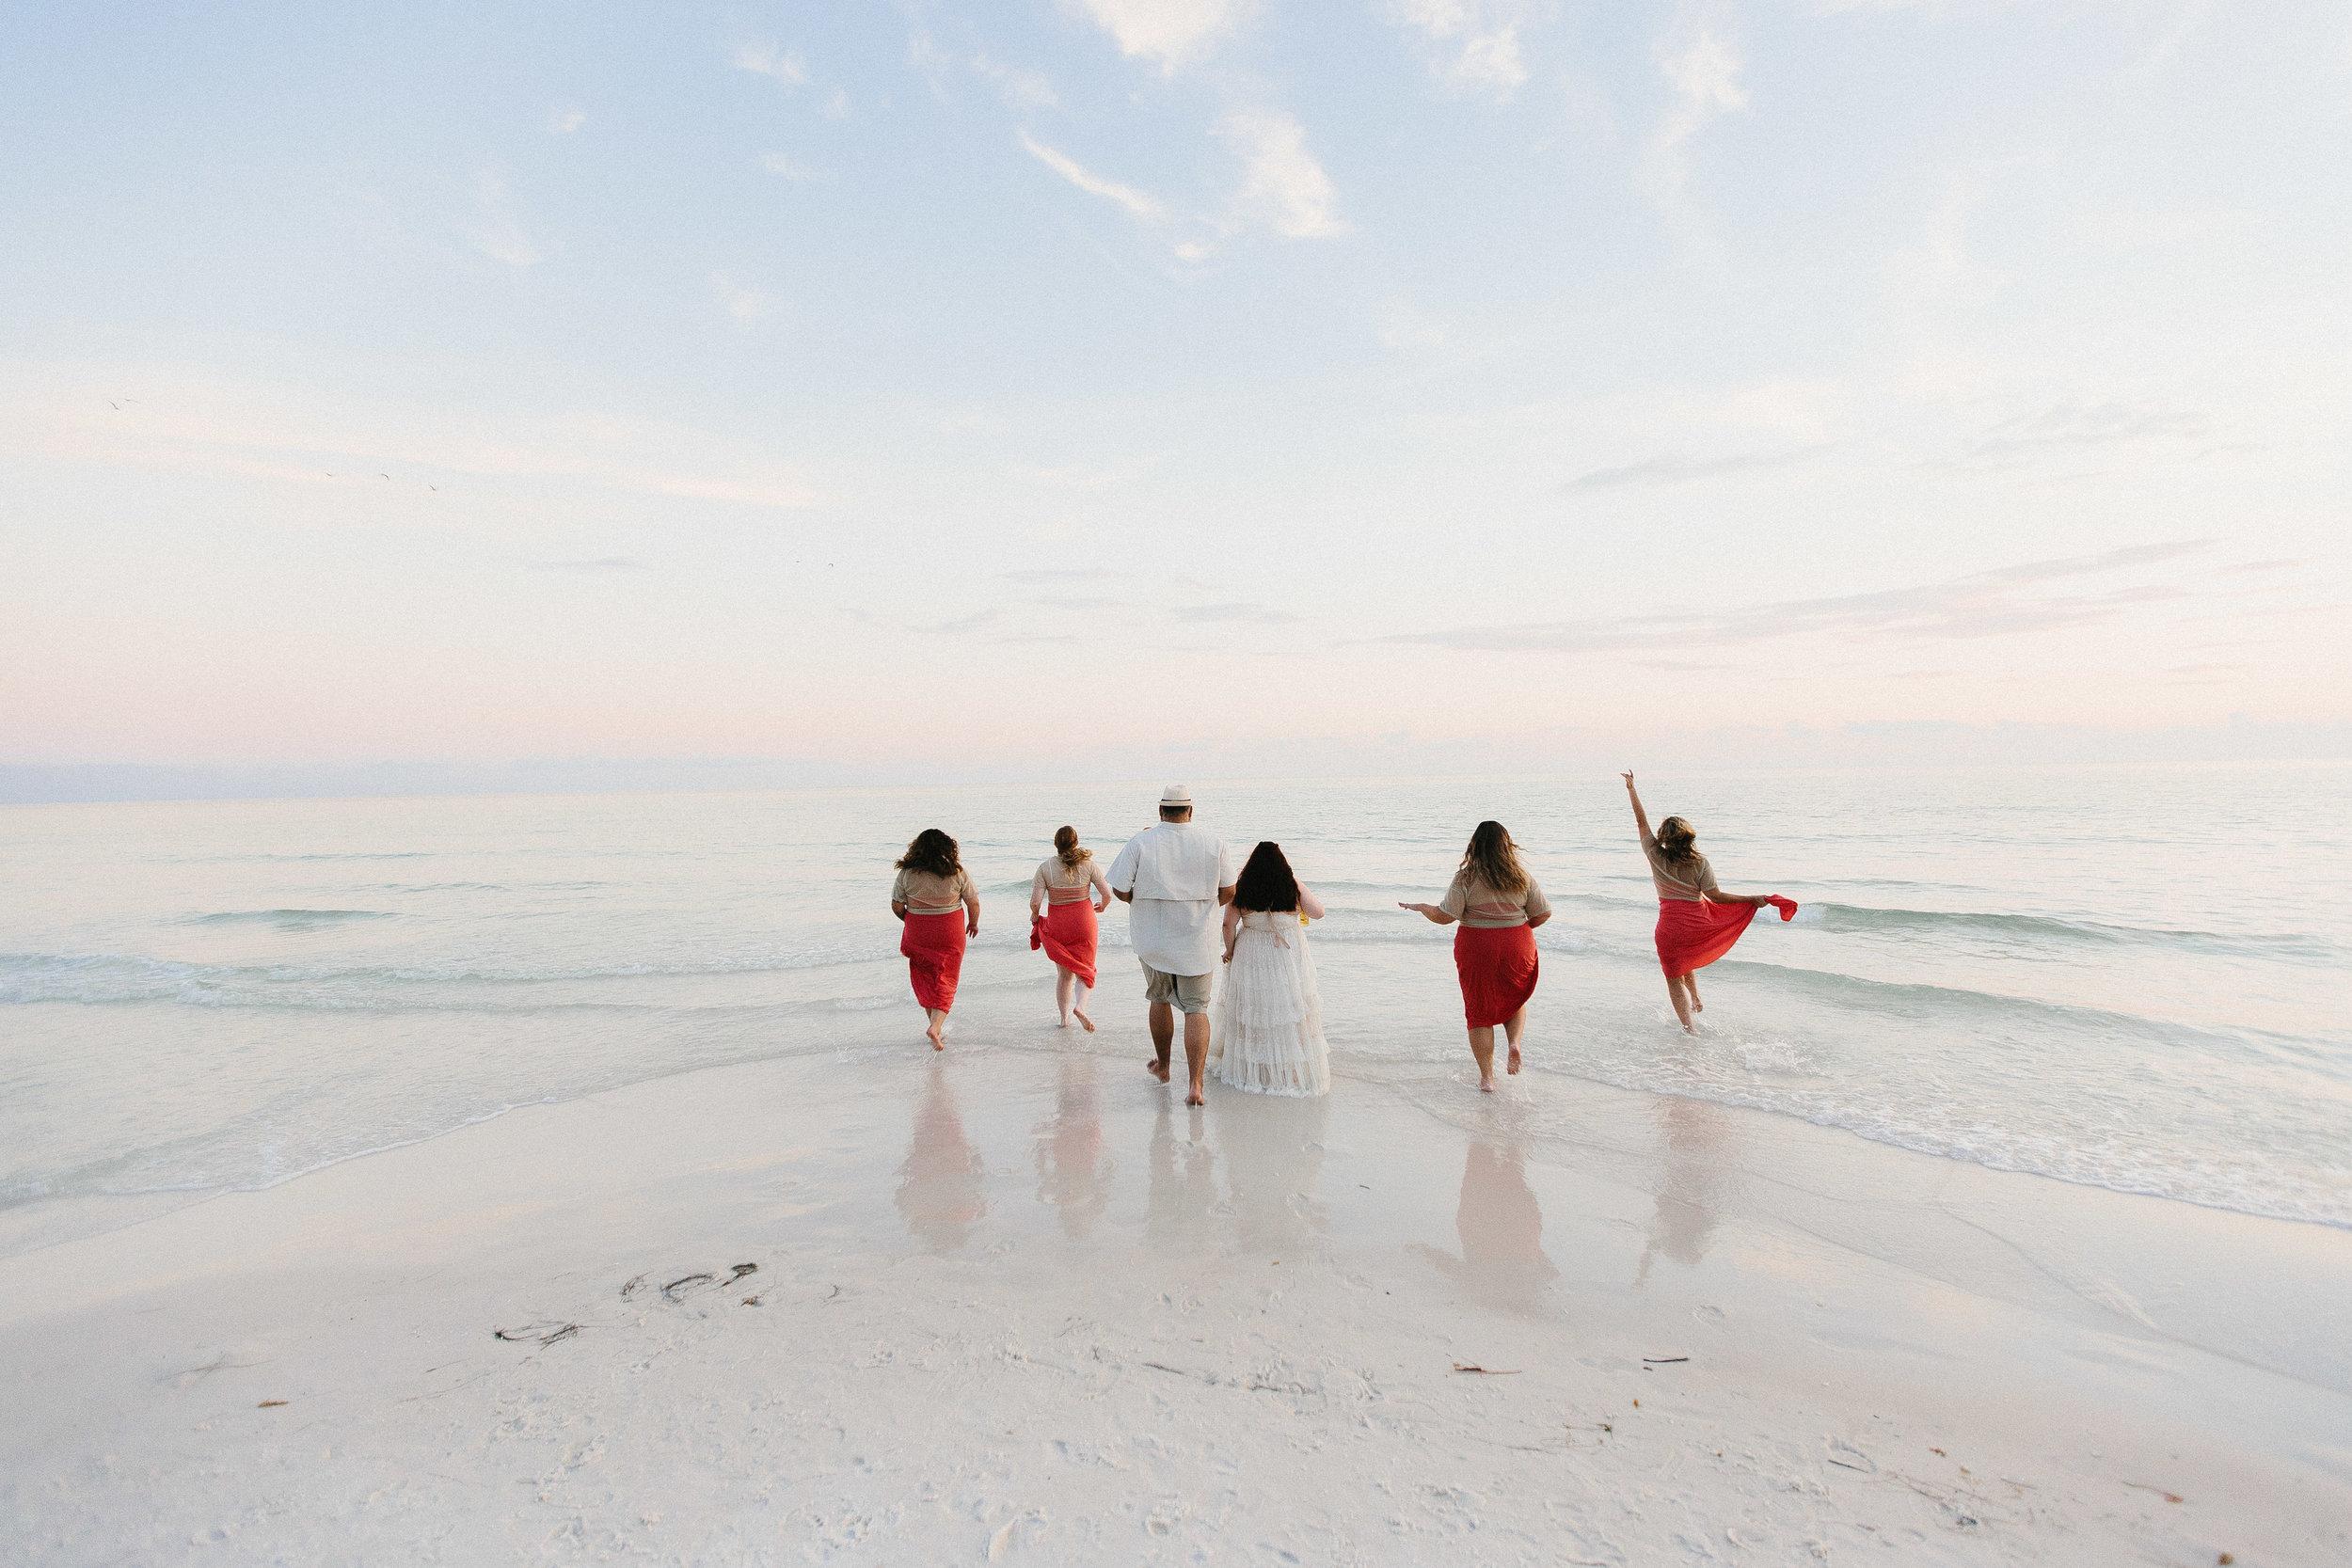 destin_sunset_beach_elopement_intimate_wedding_photographer_florida_documentary_1370.jpg